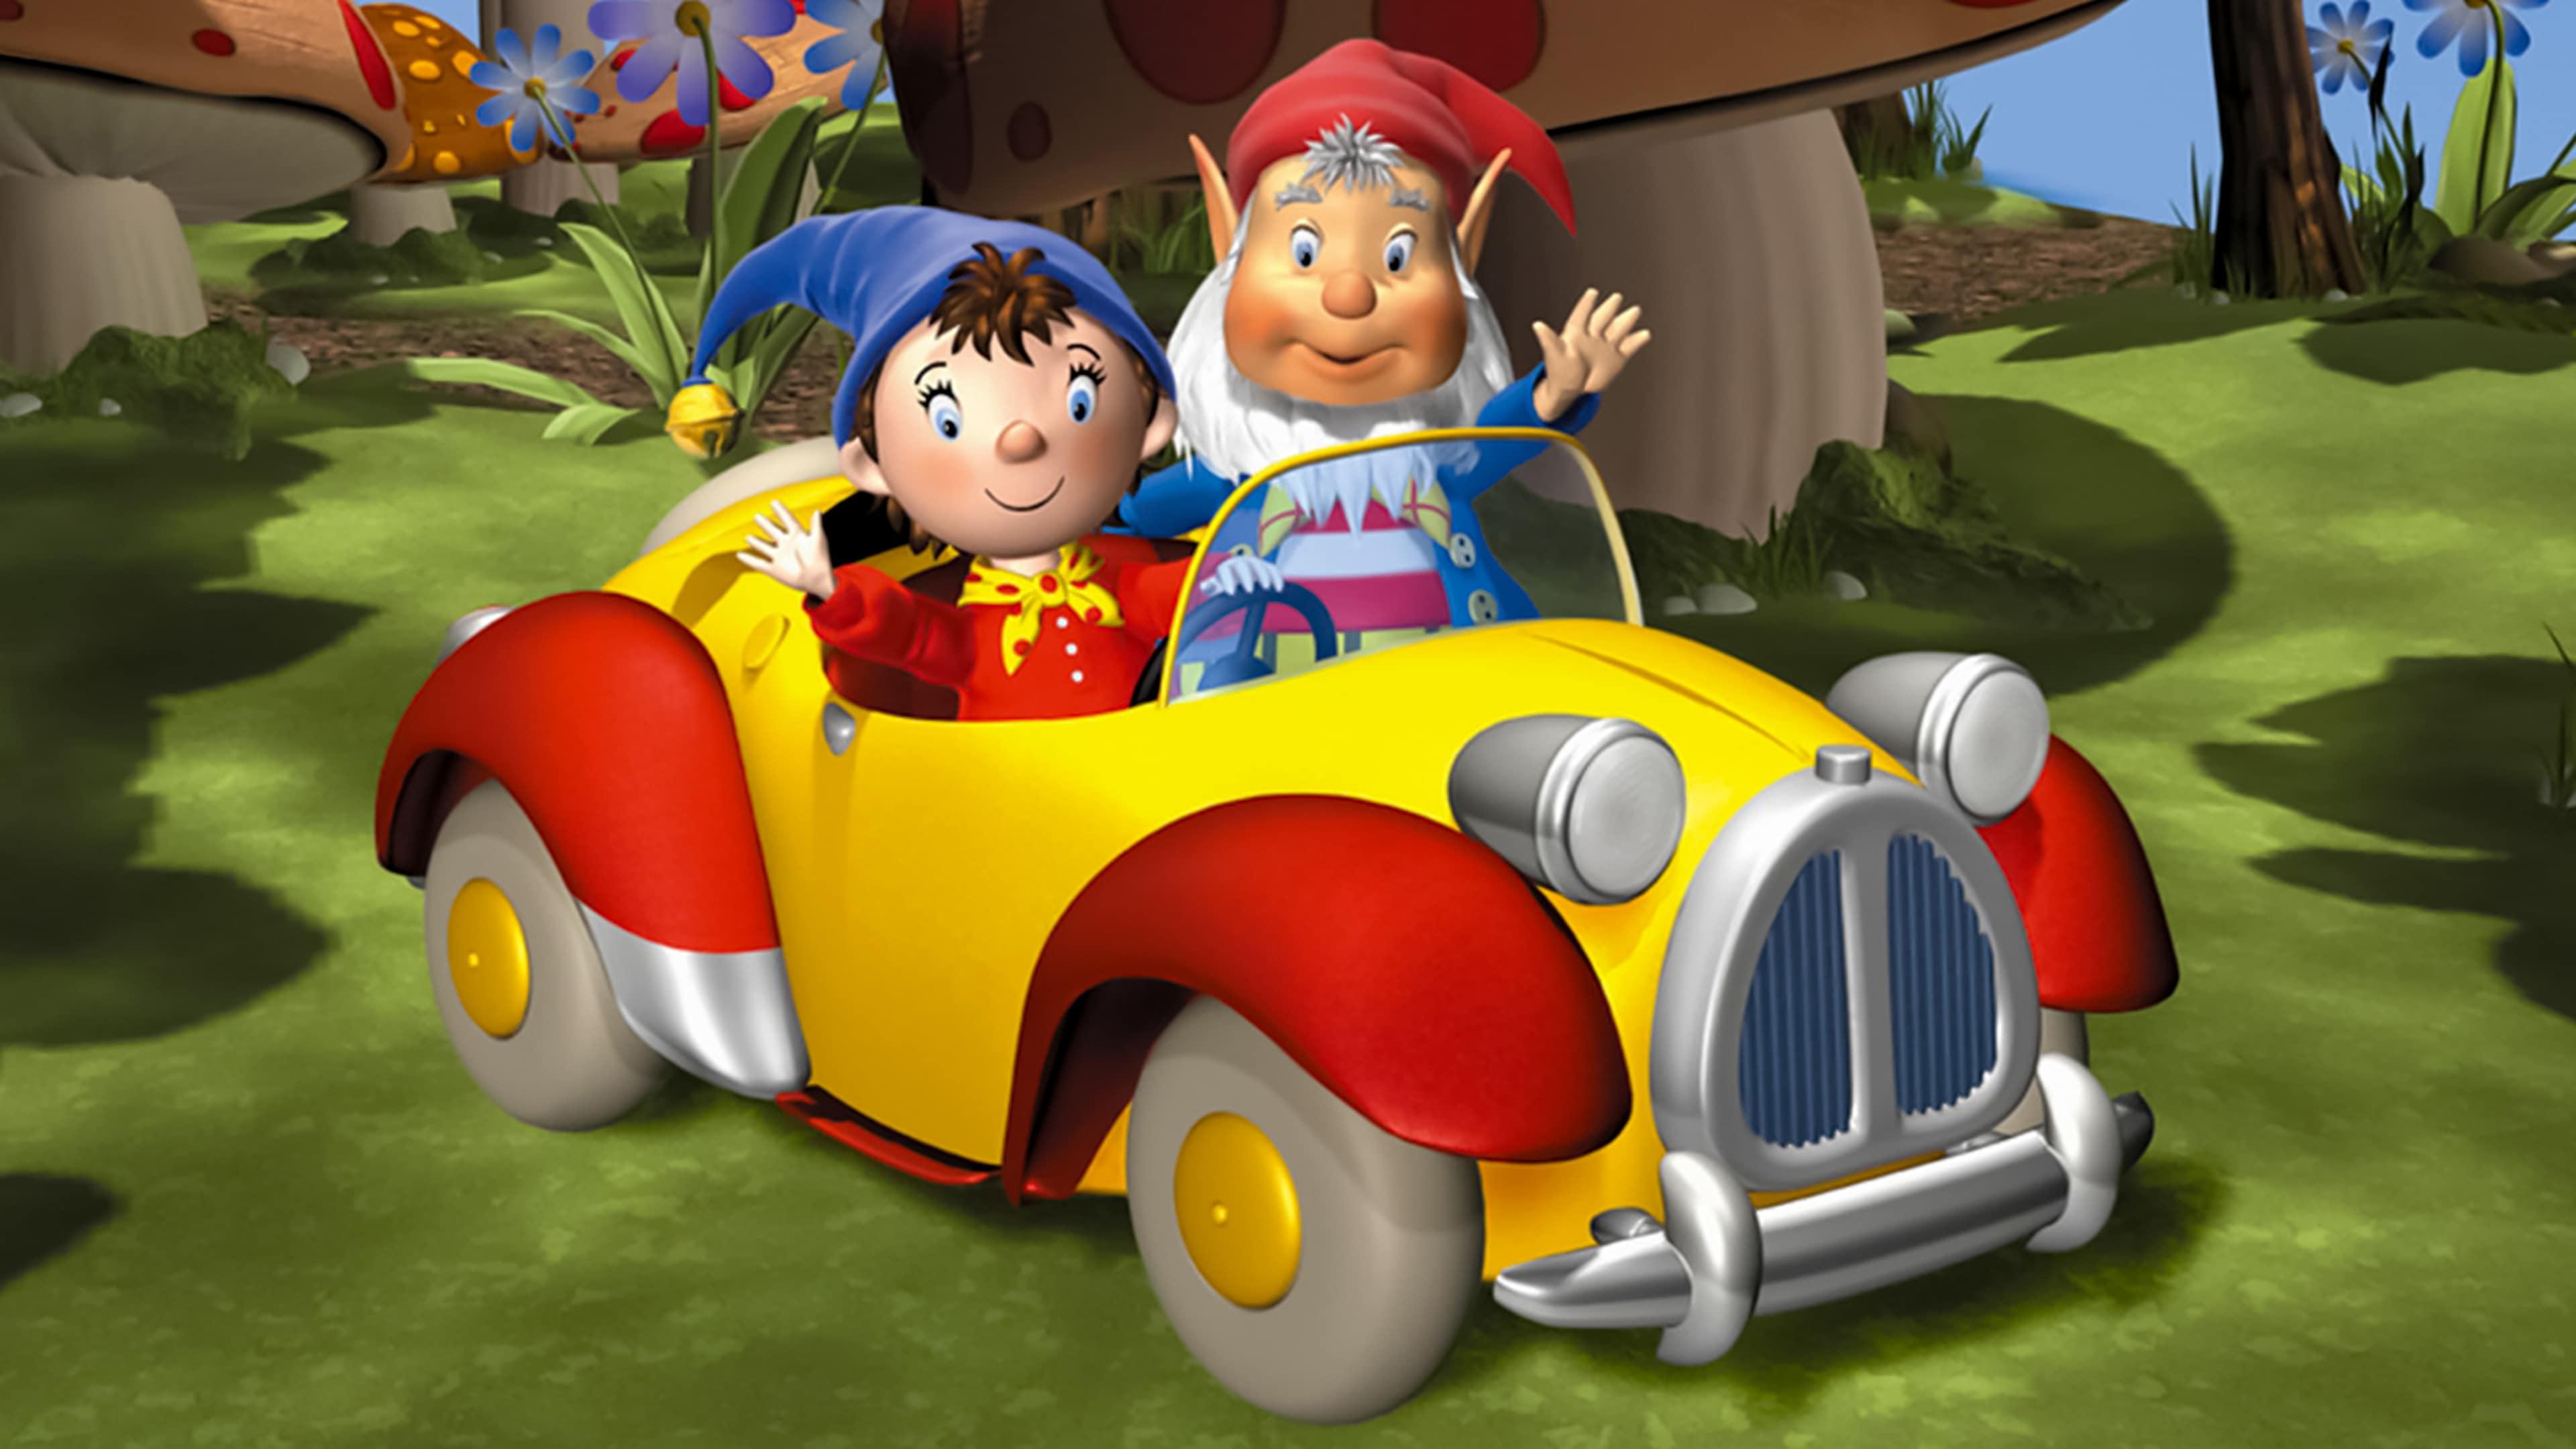 Noddy and the Singing Bush